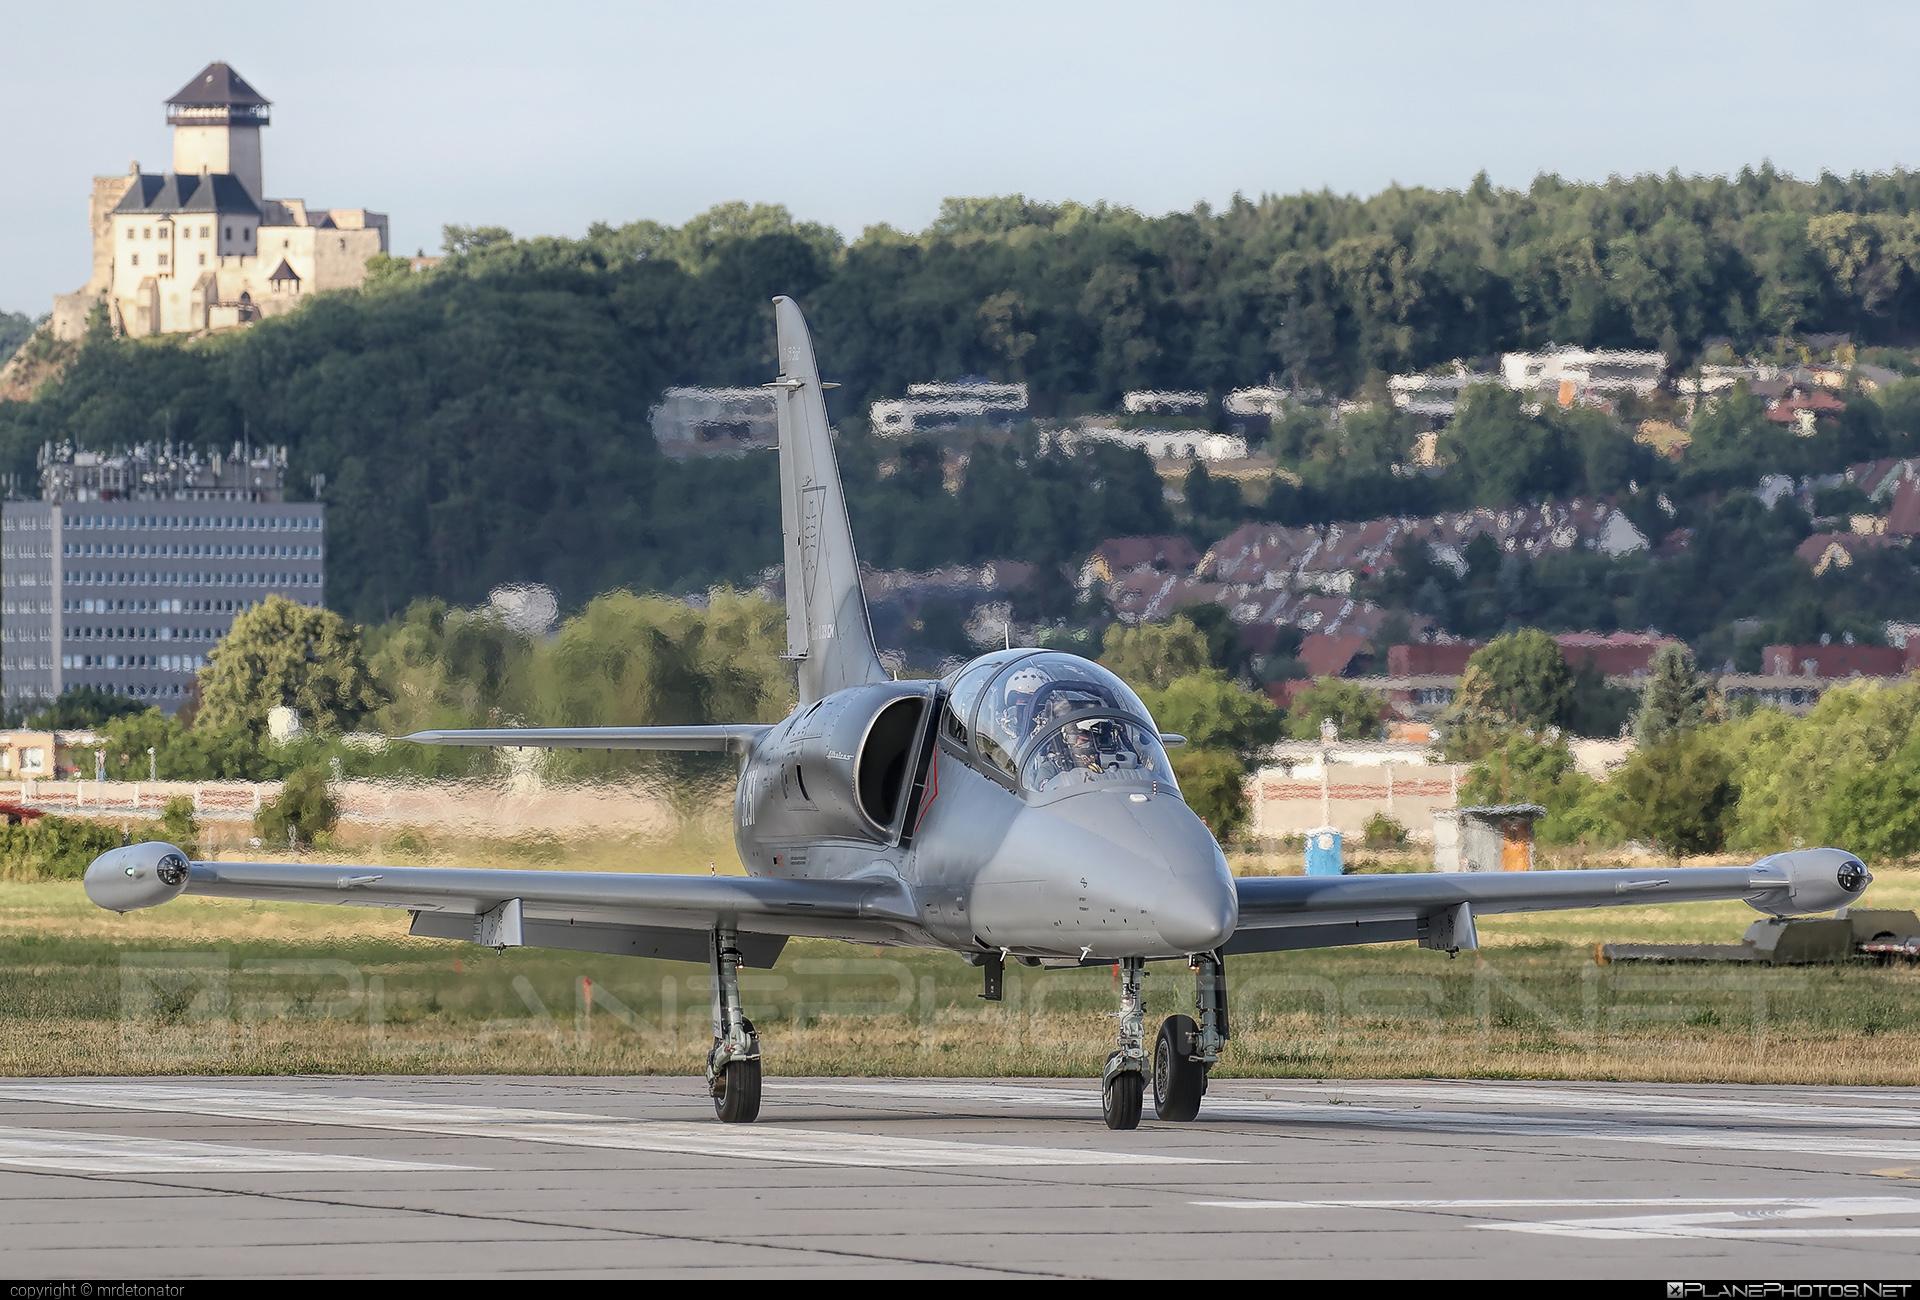 Vzdušné sily OS SR (Slovak Air Force) Aero L-39CM Albatros - 5251 #aero #slovakairforce #vzdusnesilyossr